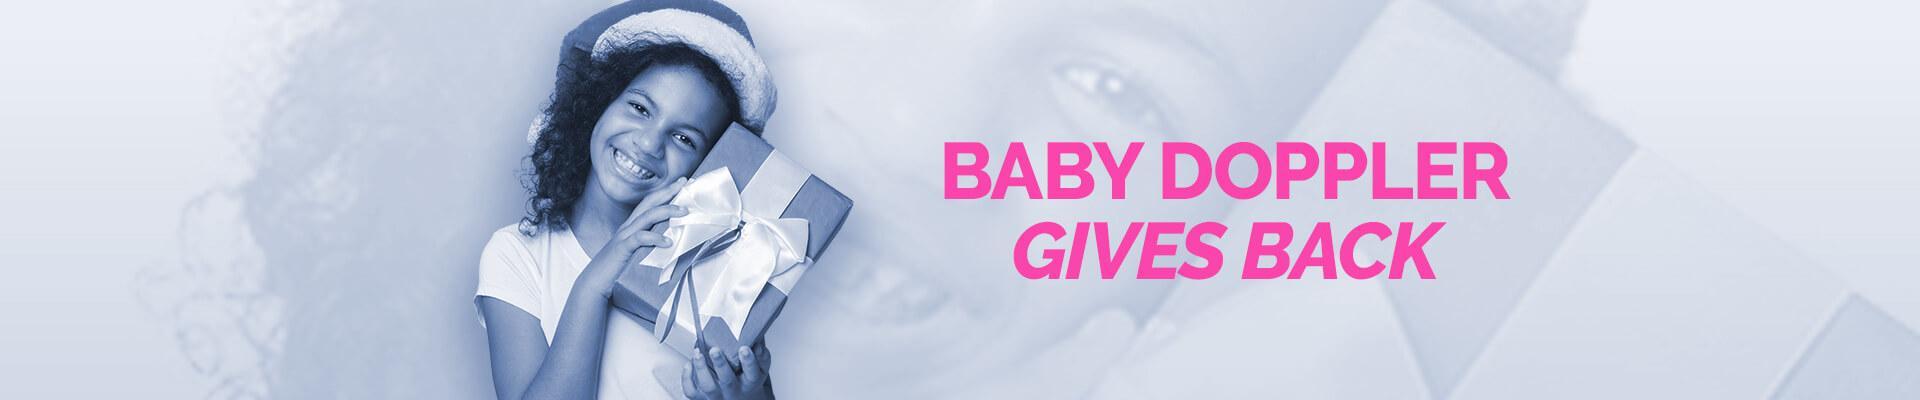 Baby_Doppler_gives_back_1920_width